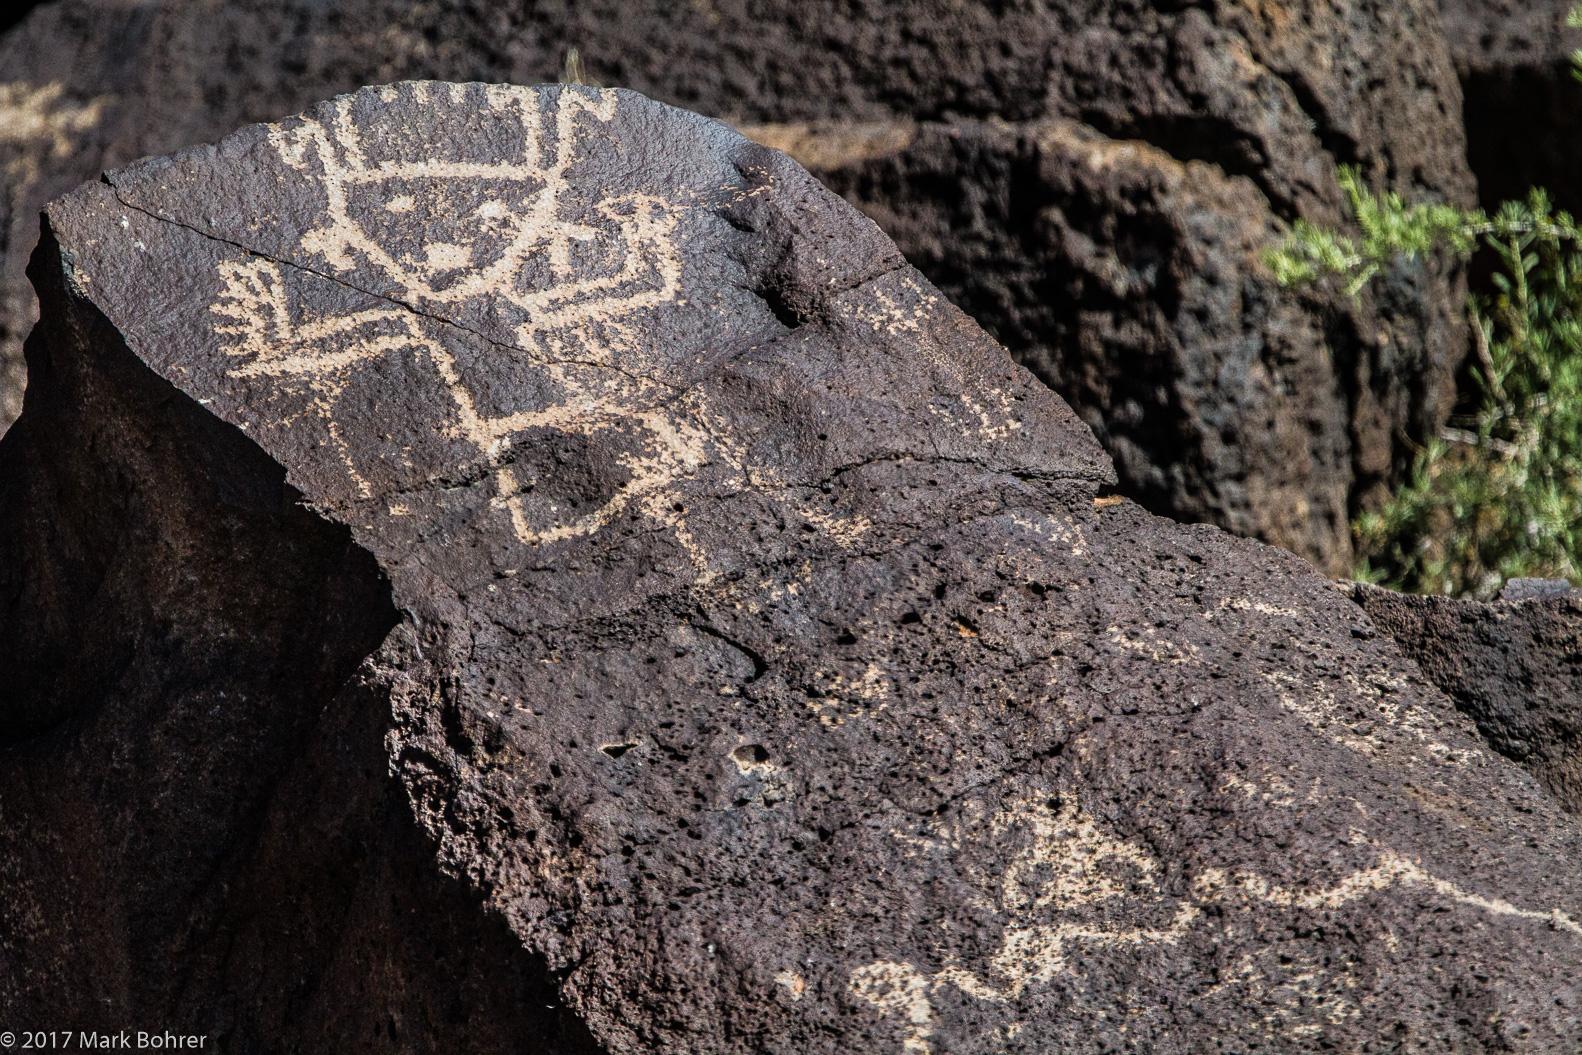 Dancing shaman, Piedras Marcadas Canyon, Petroglyph National Monument